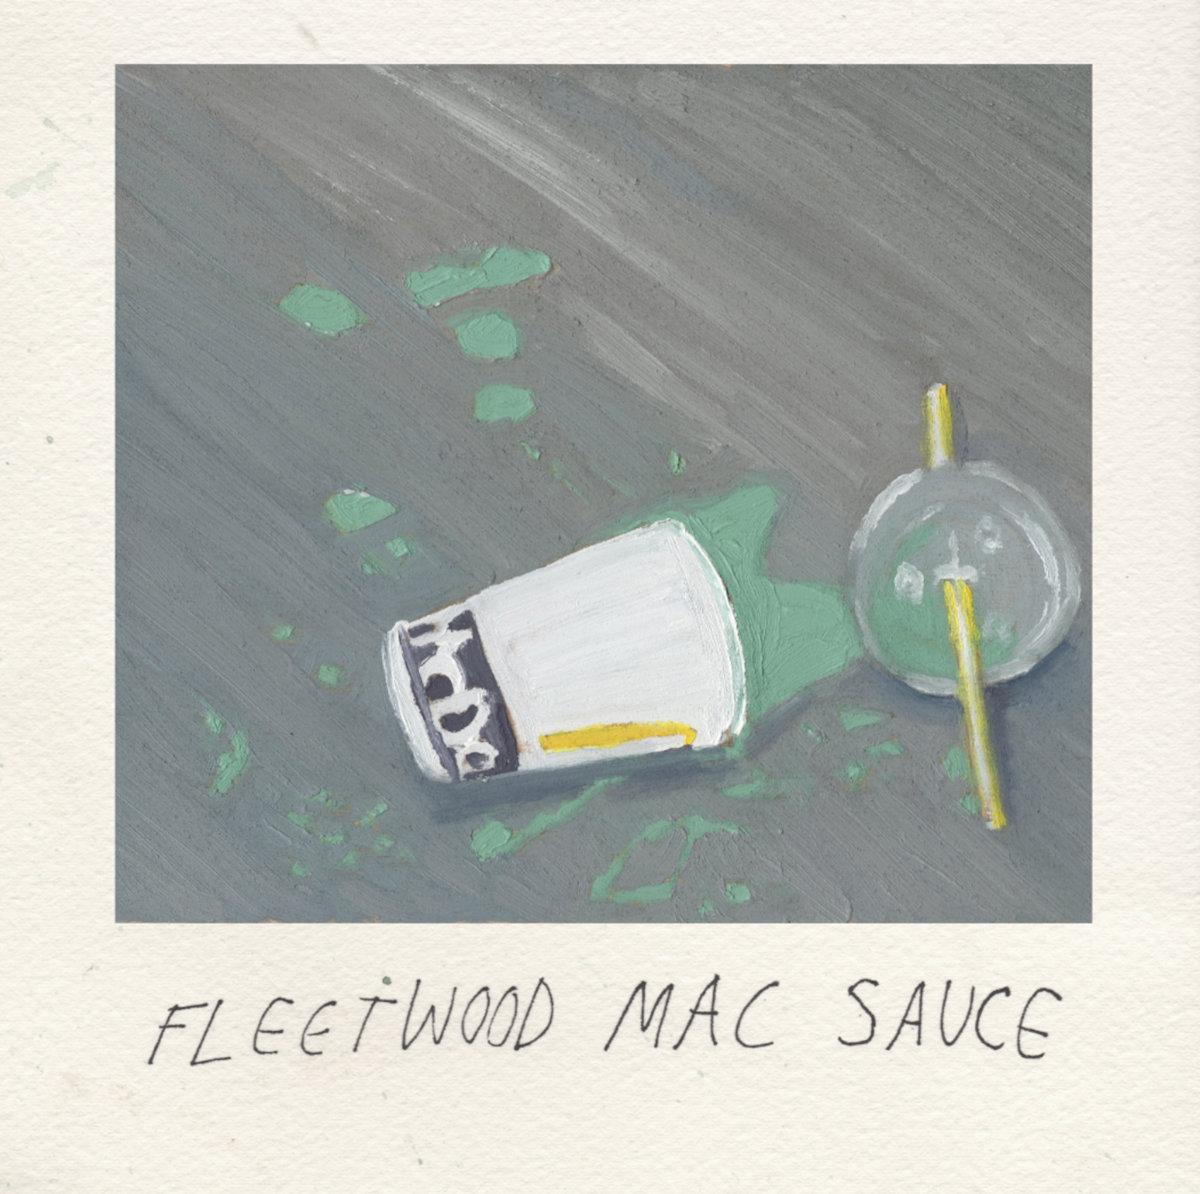 halloween   fleetwood mac sauce